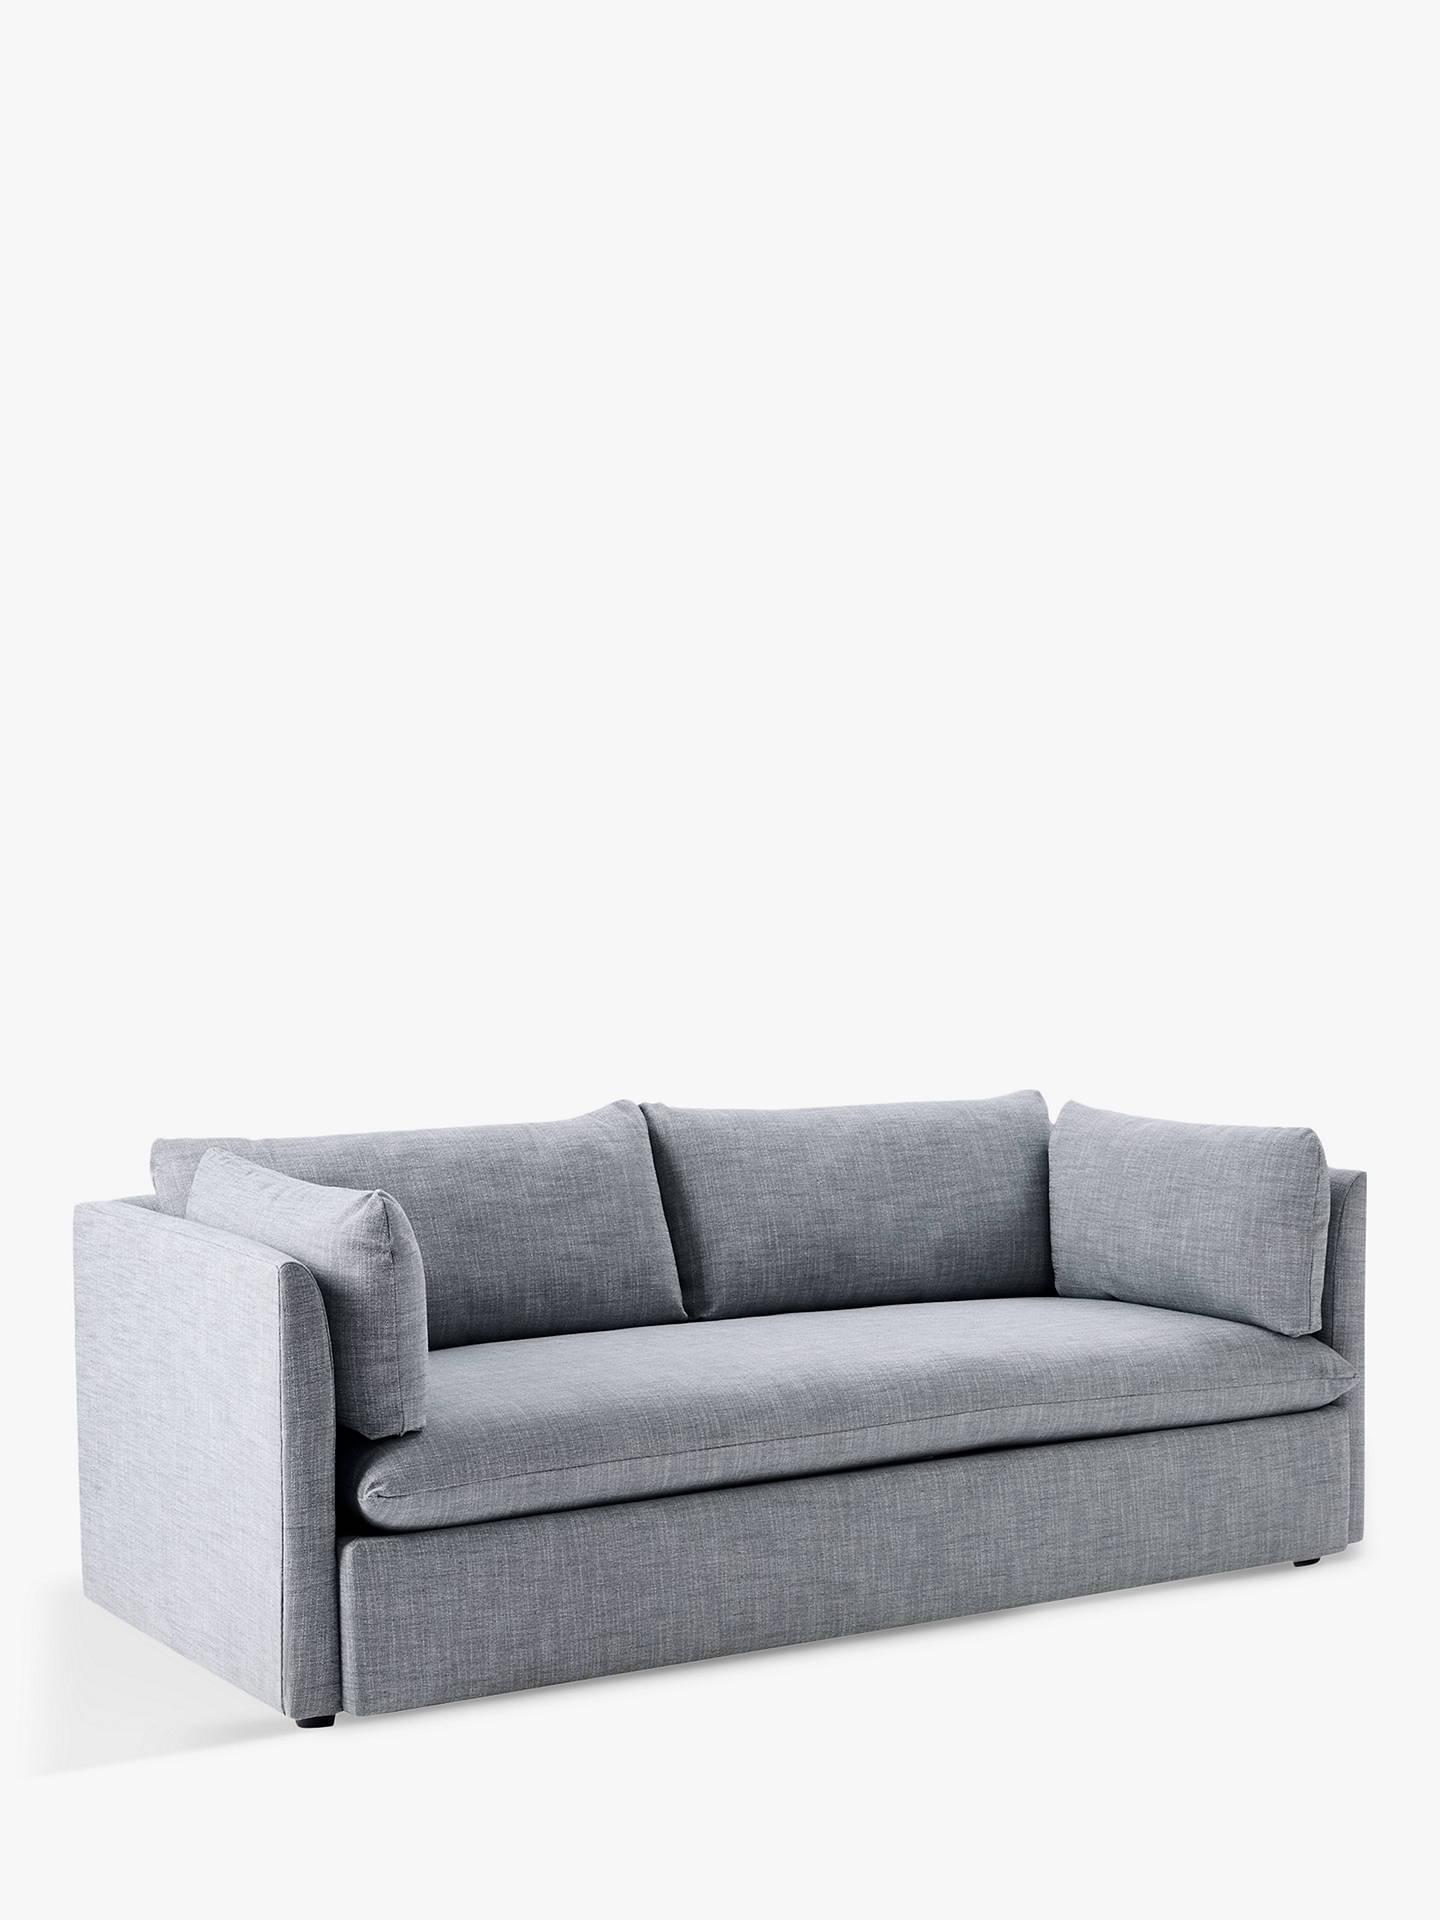 save off 4d3c3 e4100 west elm Shelter 3 Seater Sofa, Linen Weave